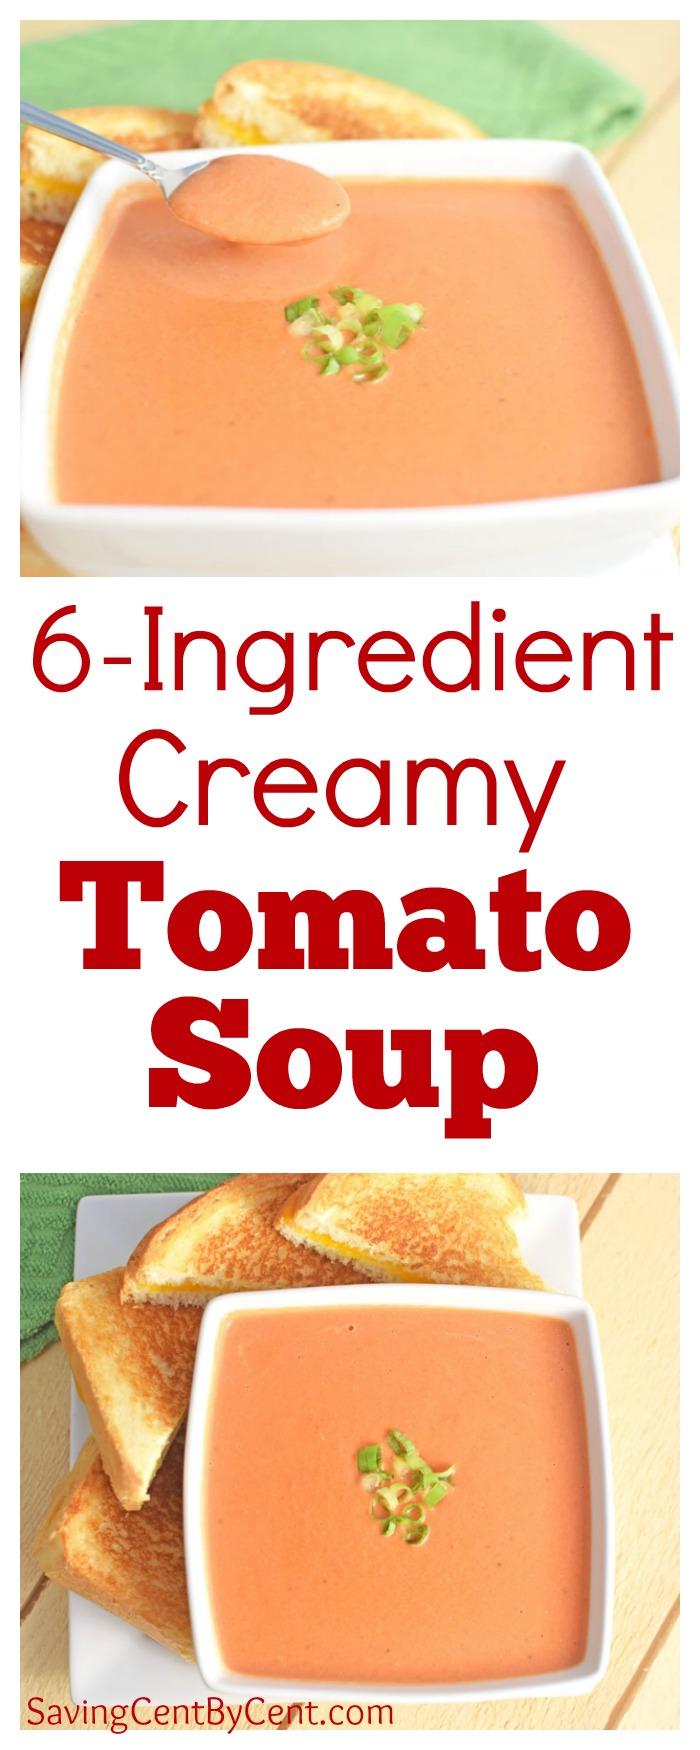 6 Ingredient Creamy Tomato Soup